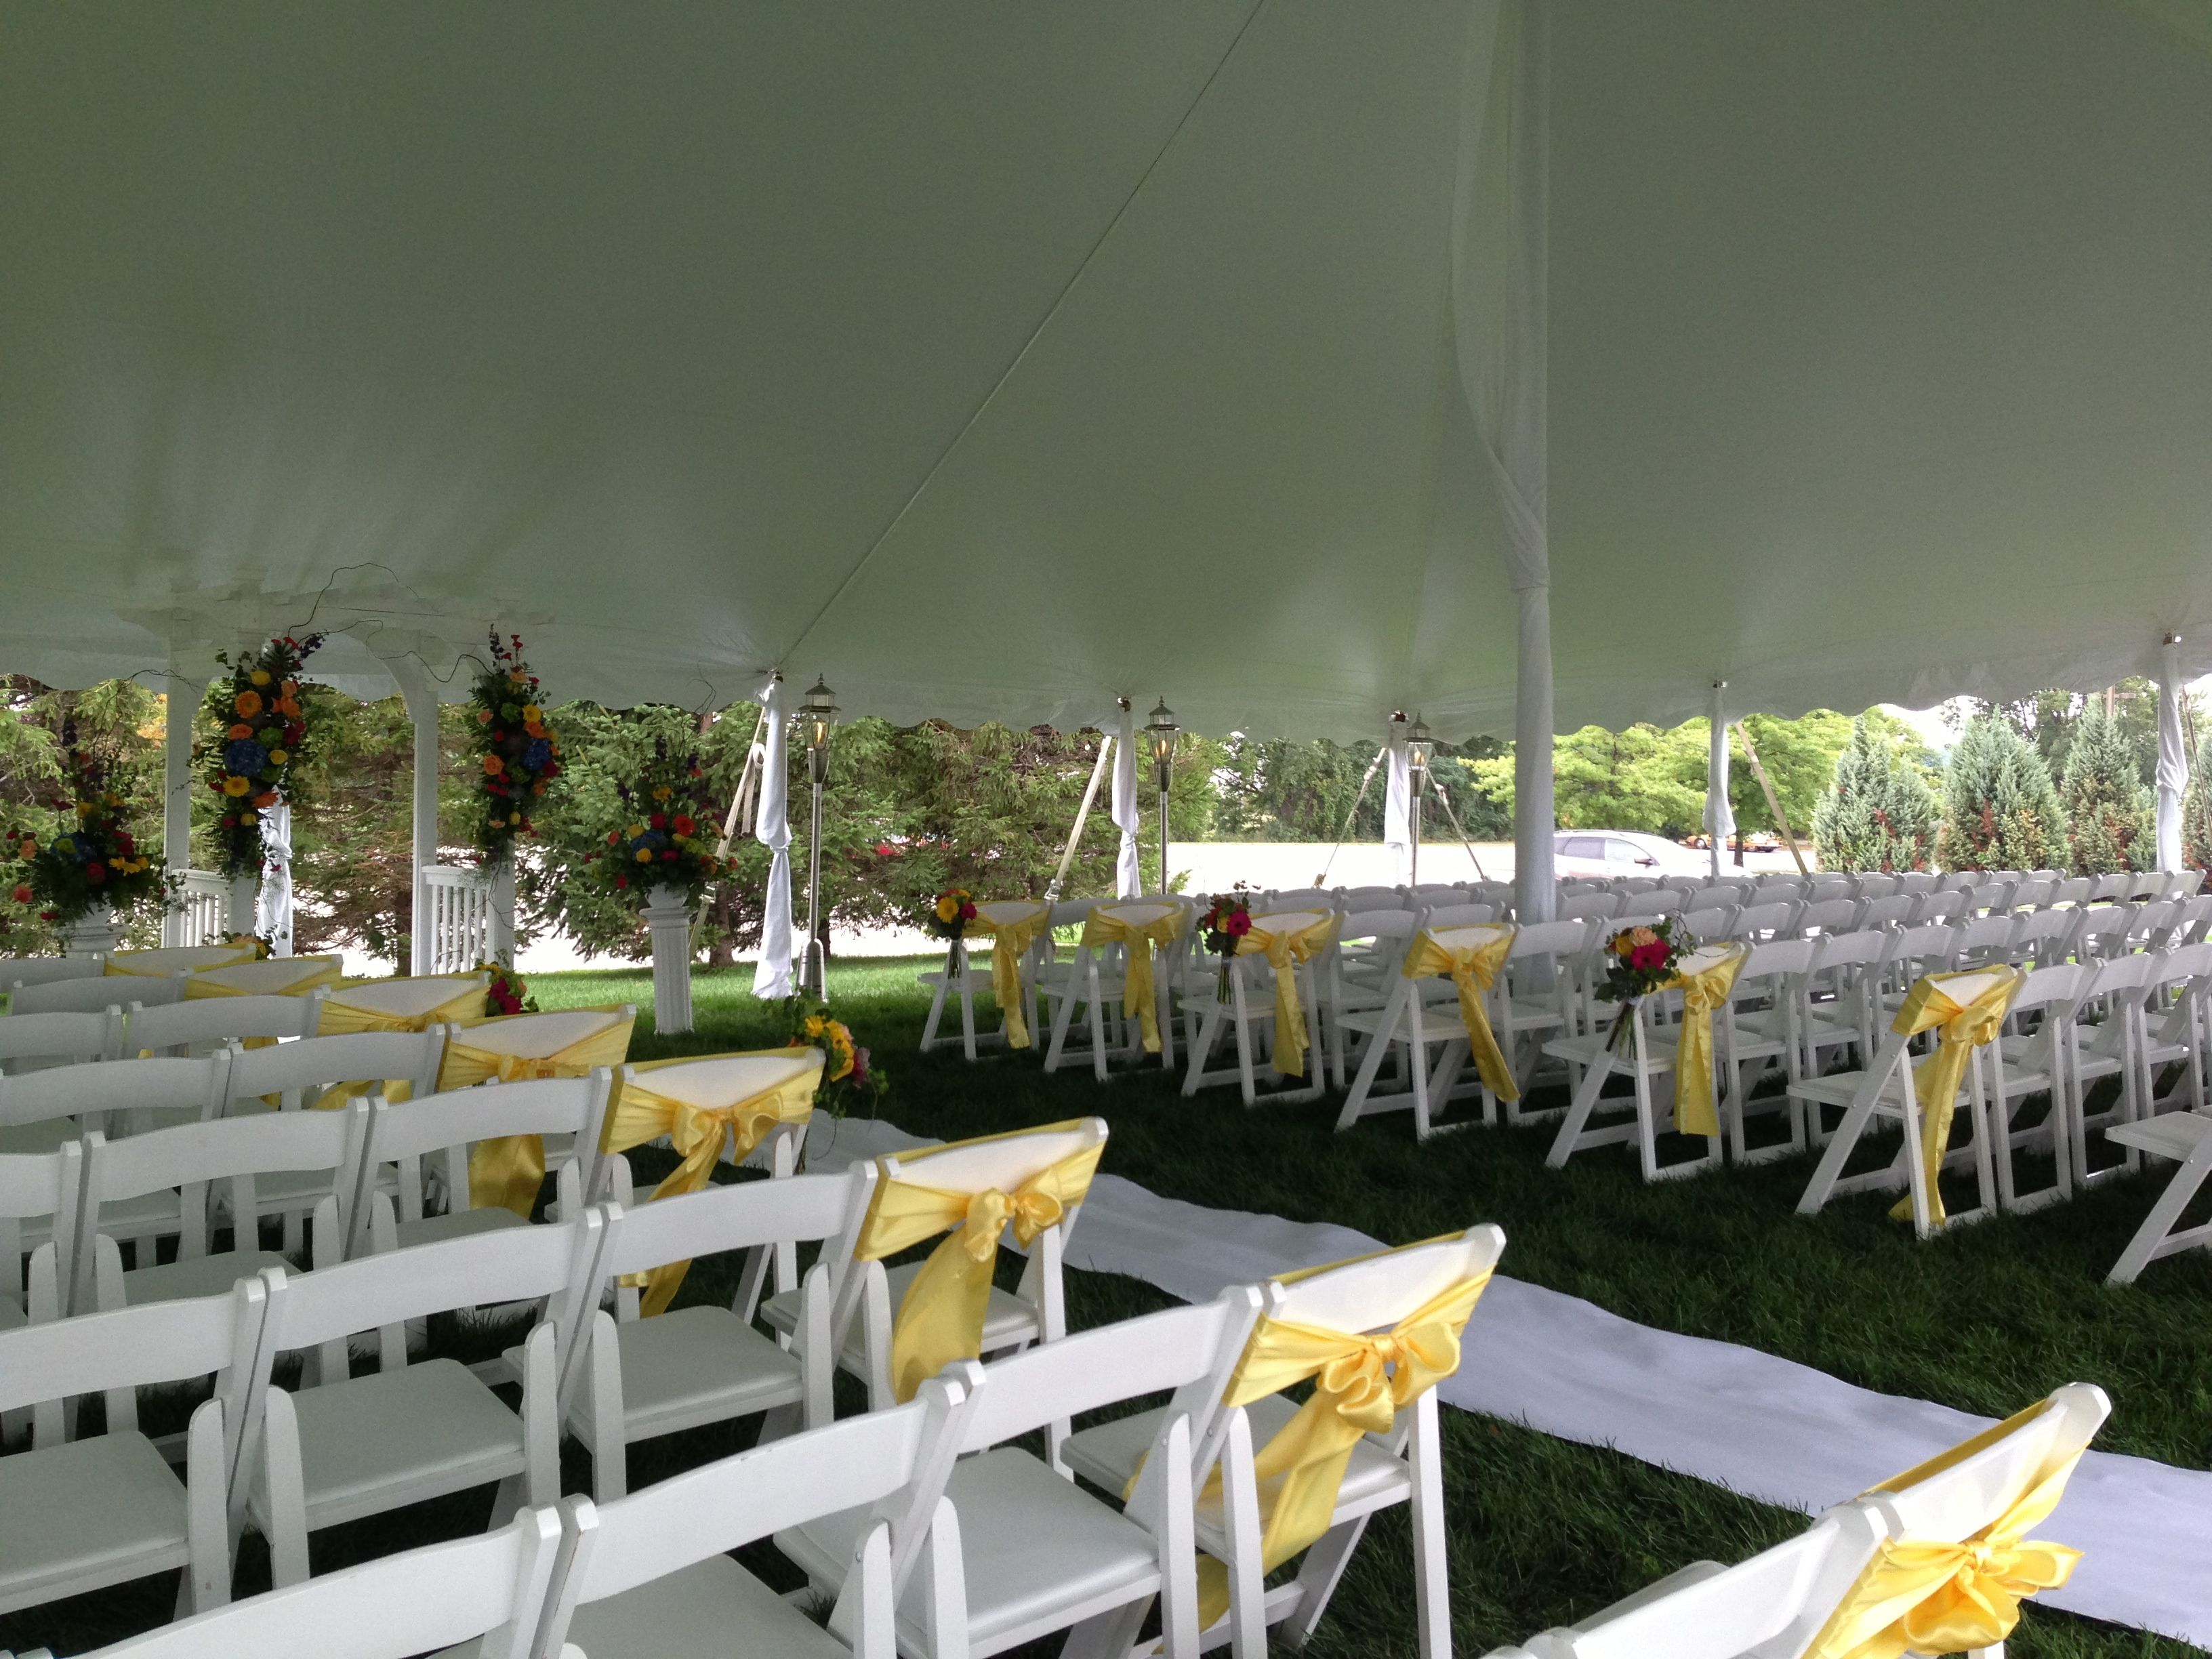 st ranch chair wedding tampa the palmetto petersburg events chairs edited at chiavari club rentals modern day fishhawk